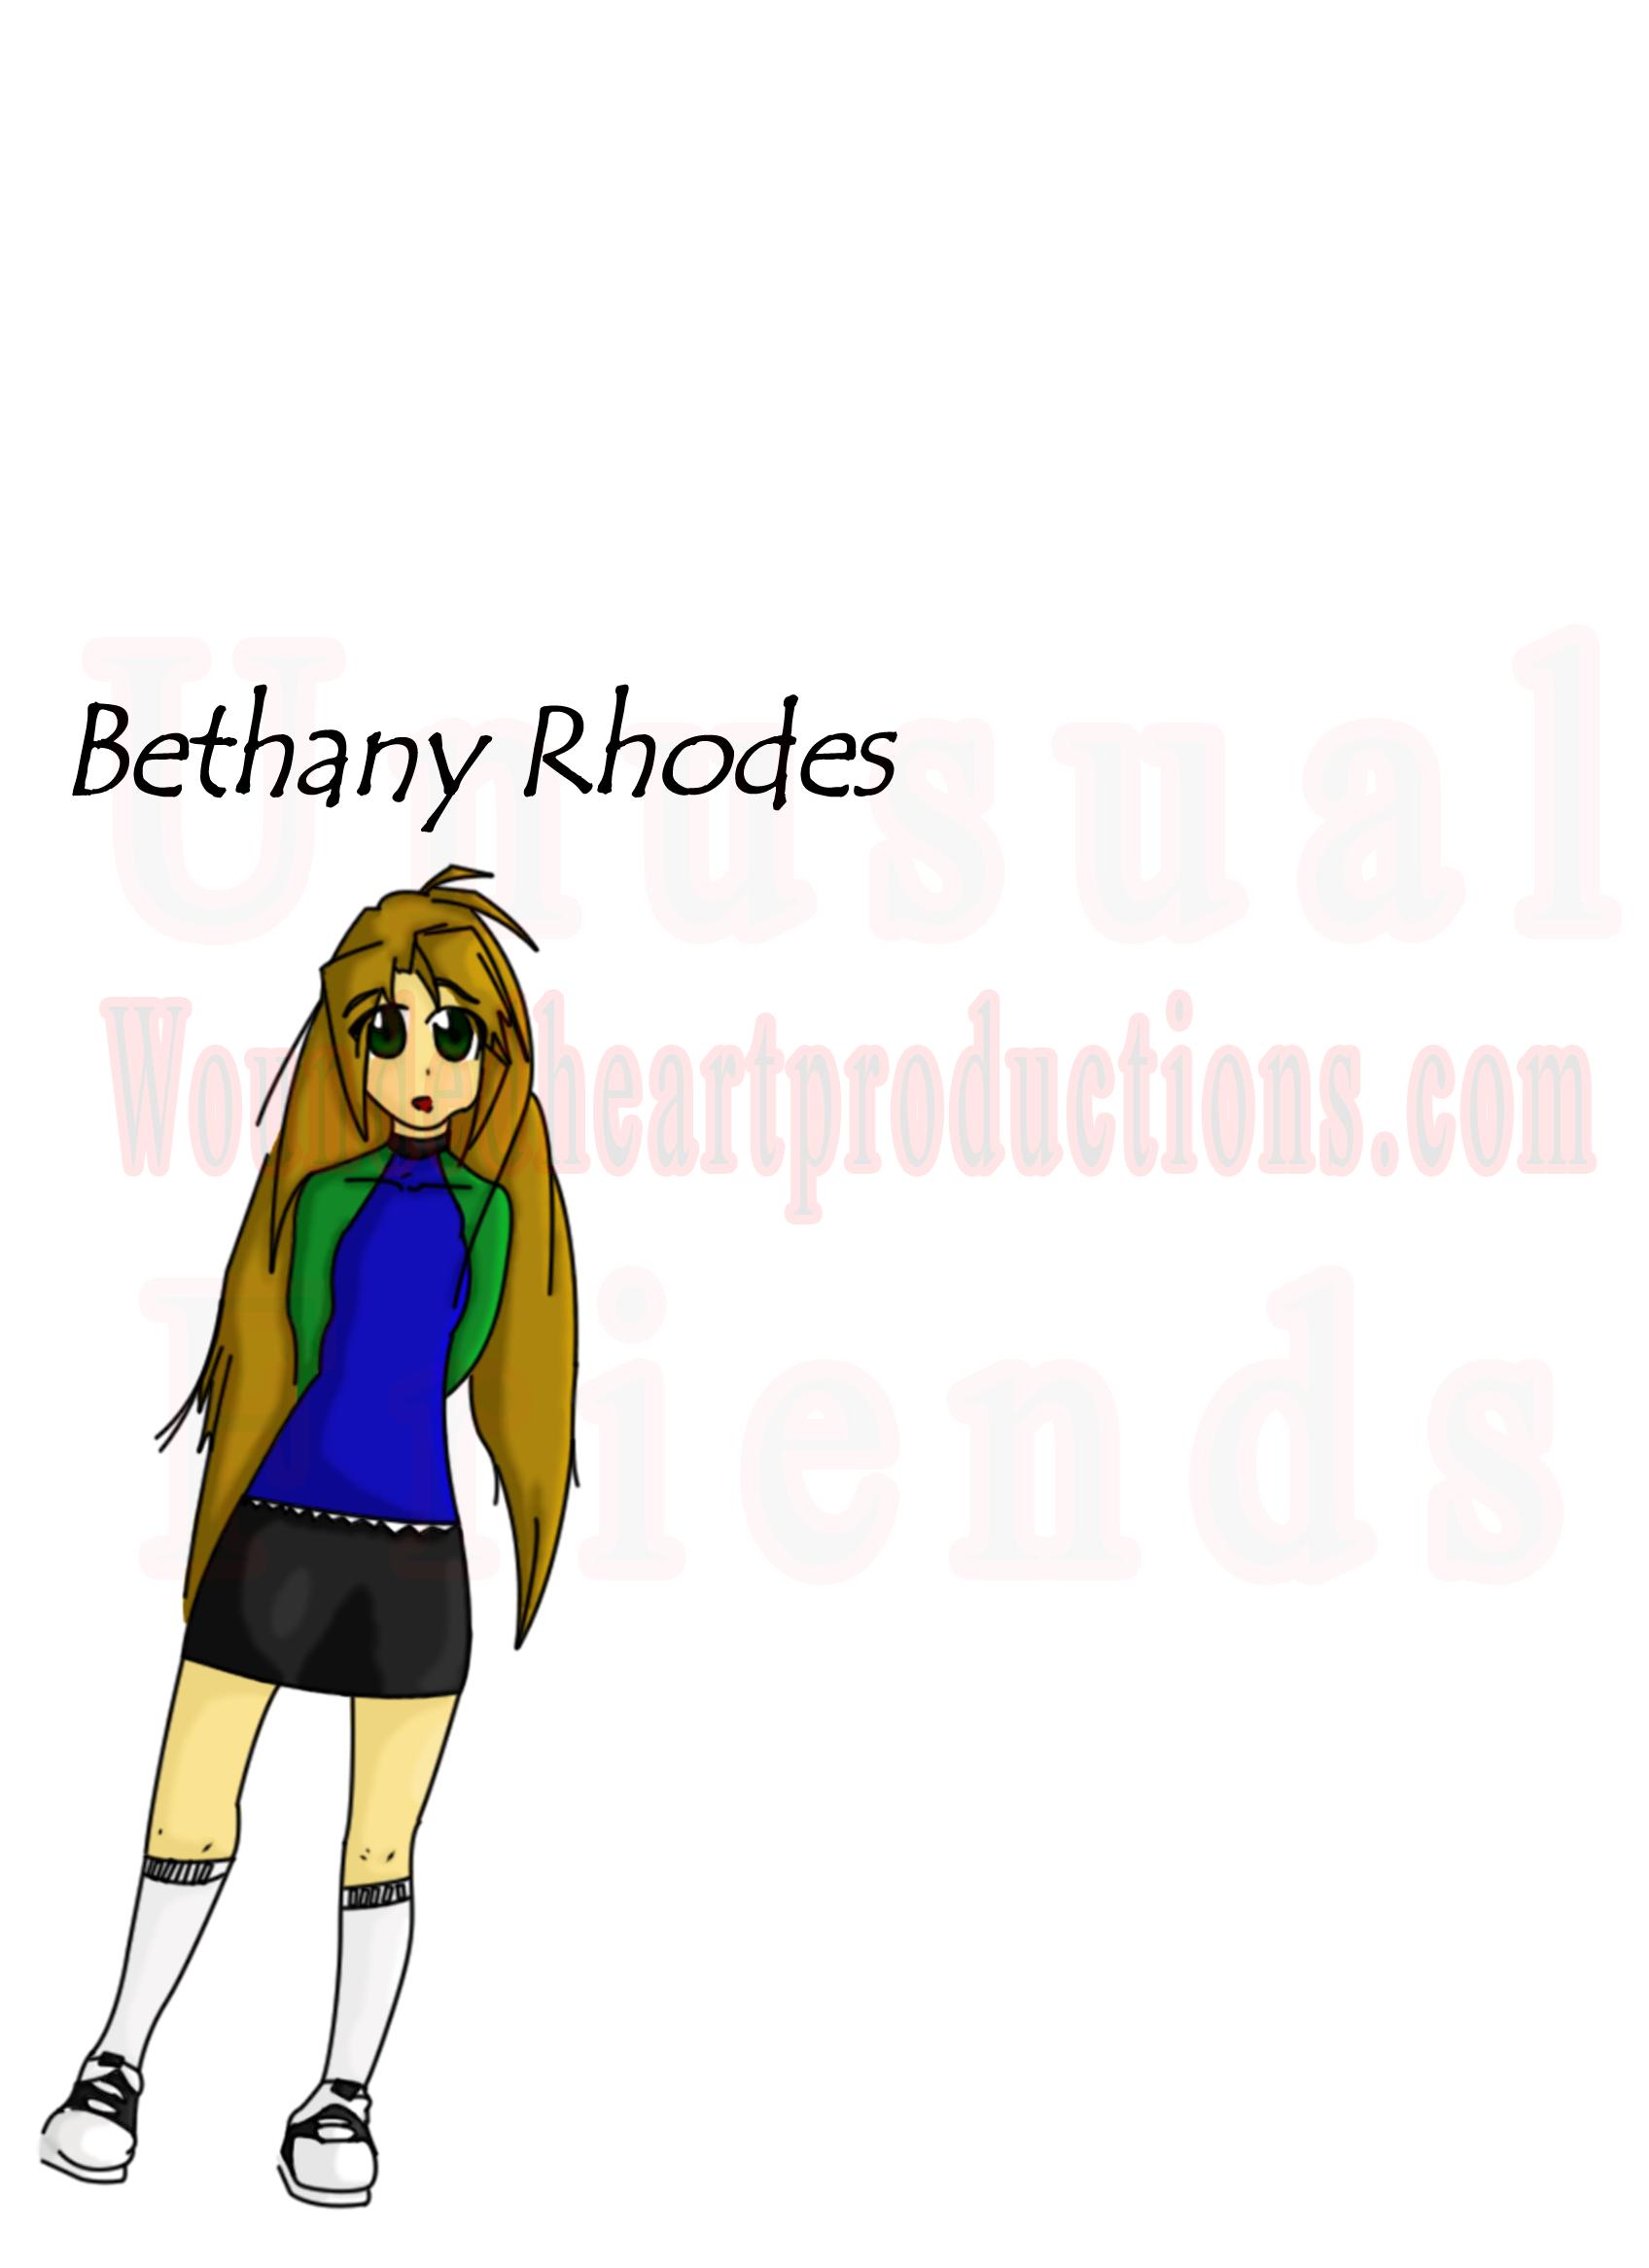 Bethany Rhodes